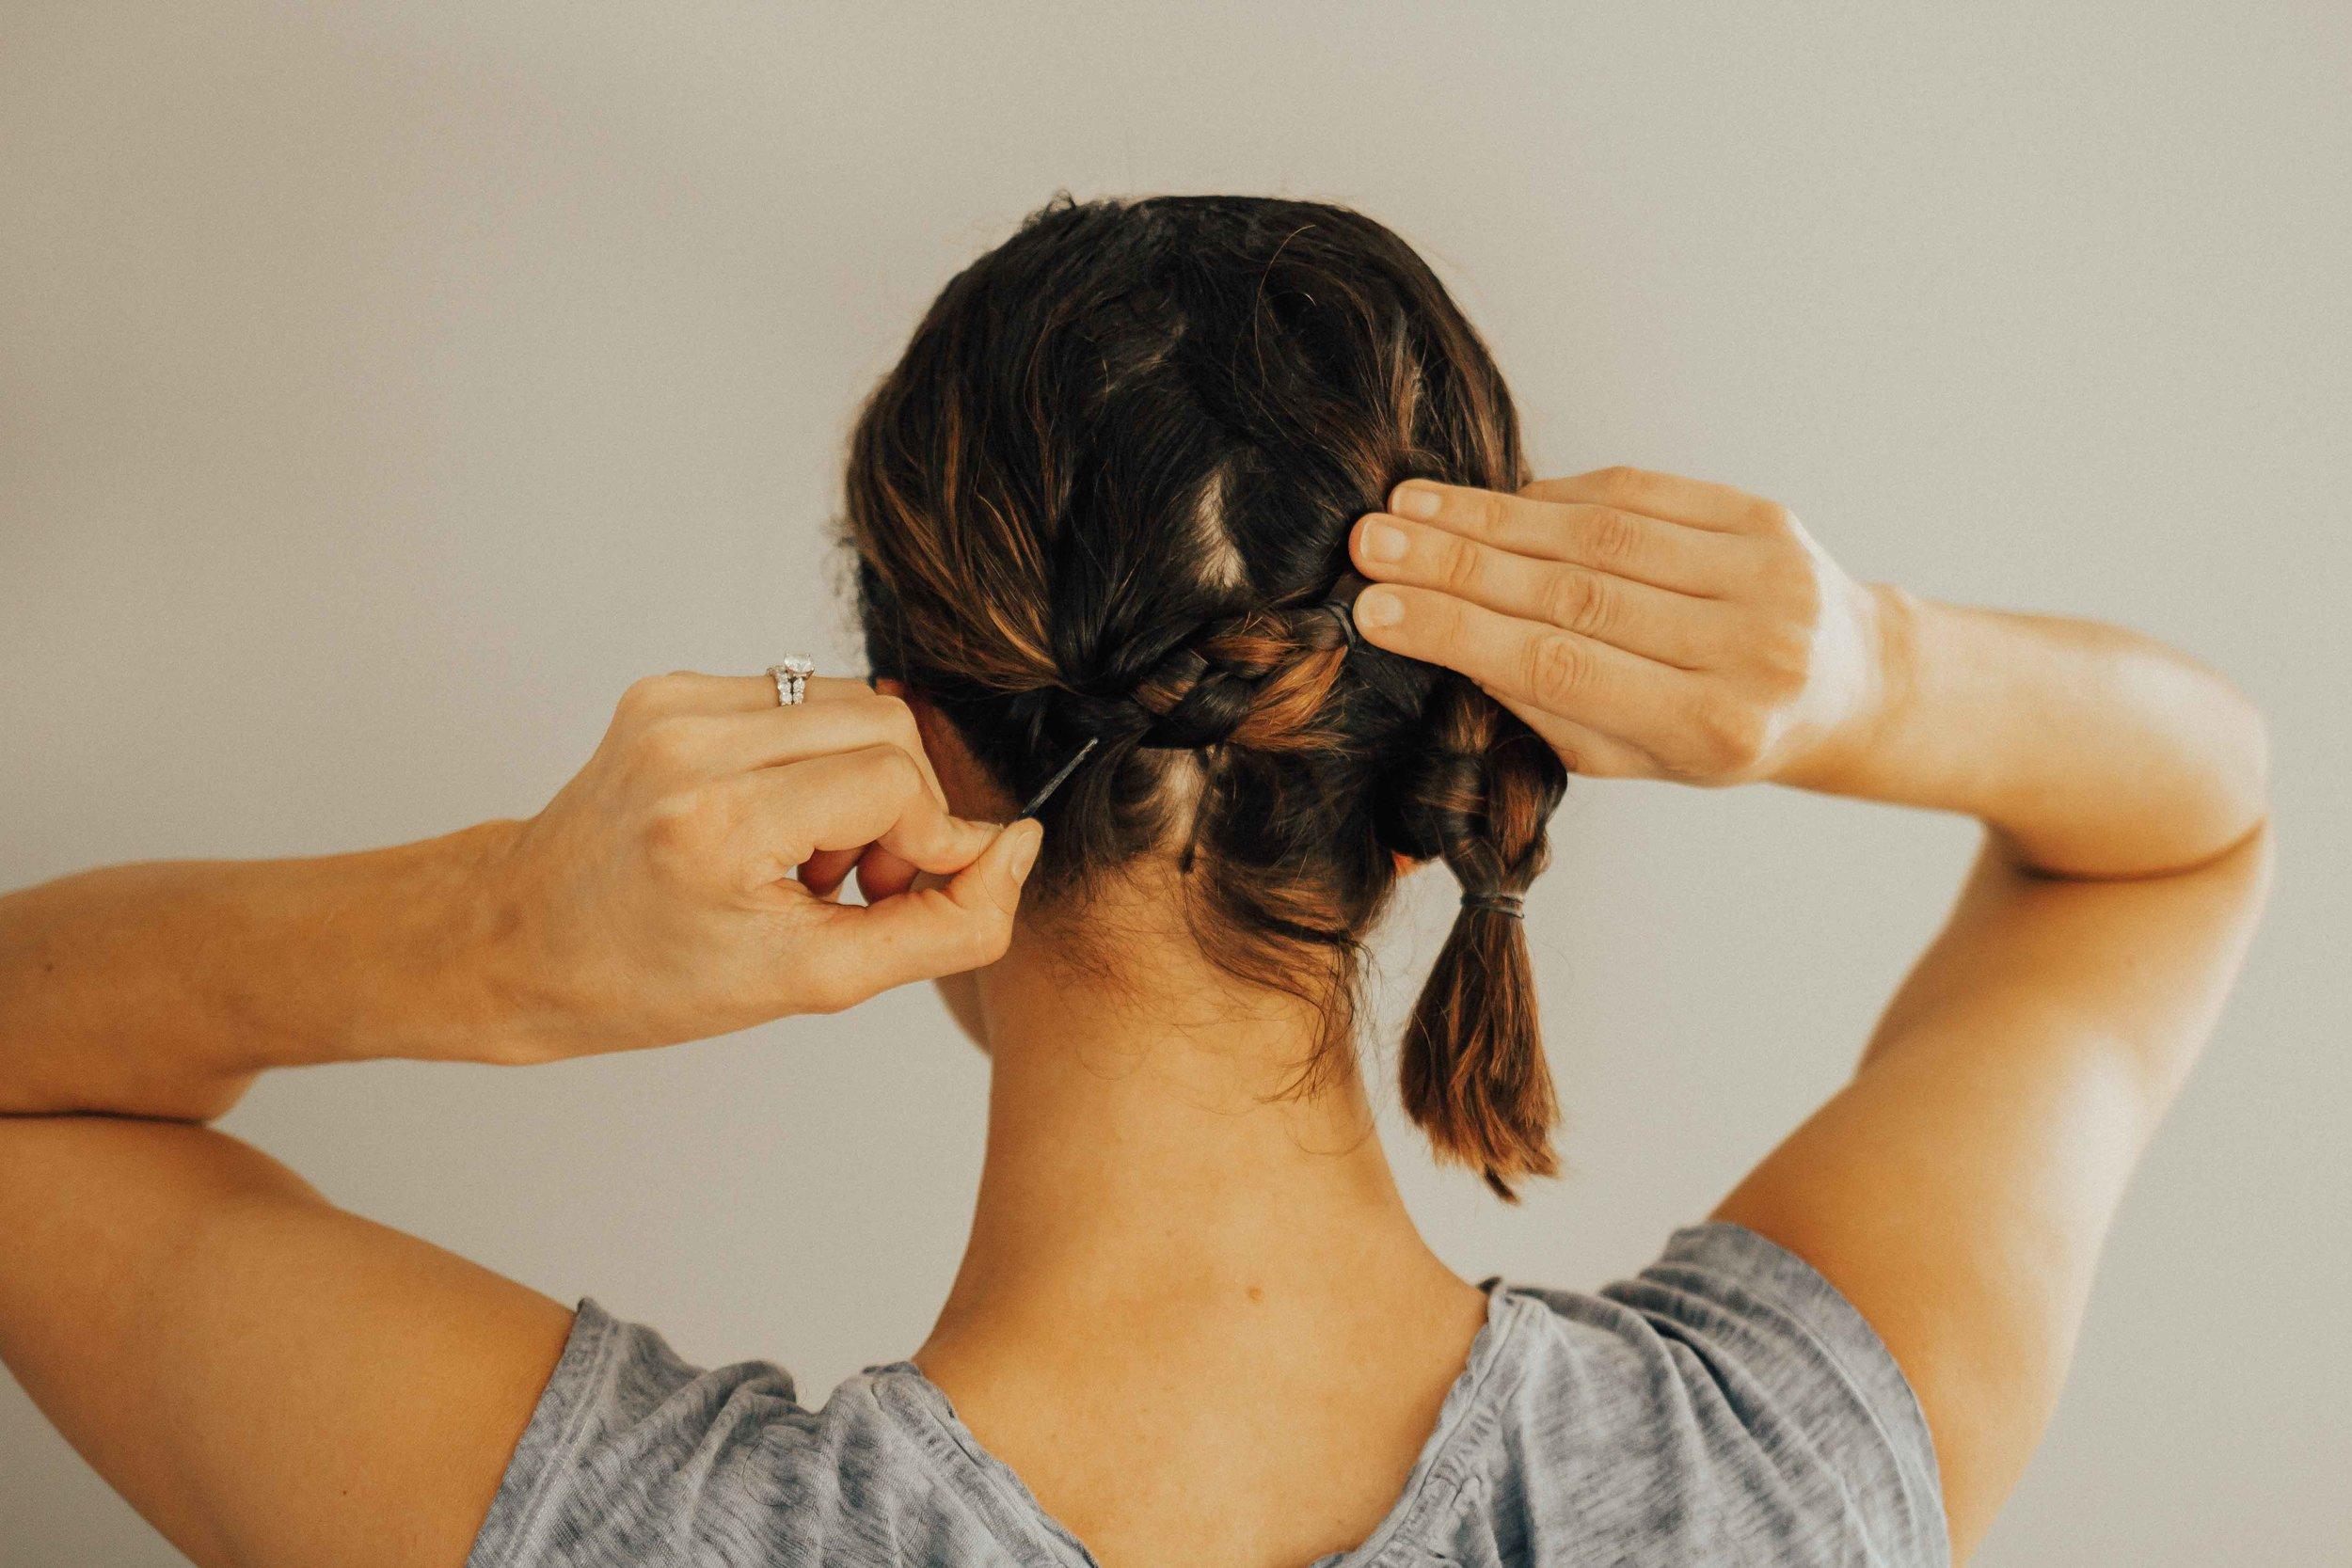 Hair Tutorial - Braided Updo Tutorial - Braided Crown Tutorial - Virtue Haircare - Bob Hair Tutorial -  www.heartandseam.com  #heartandseam